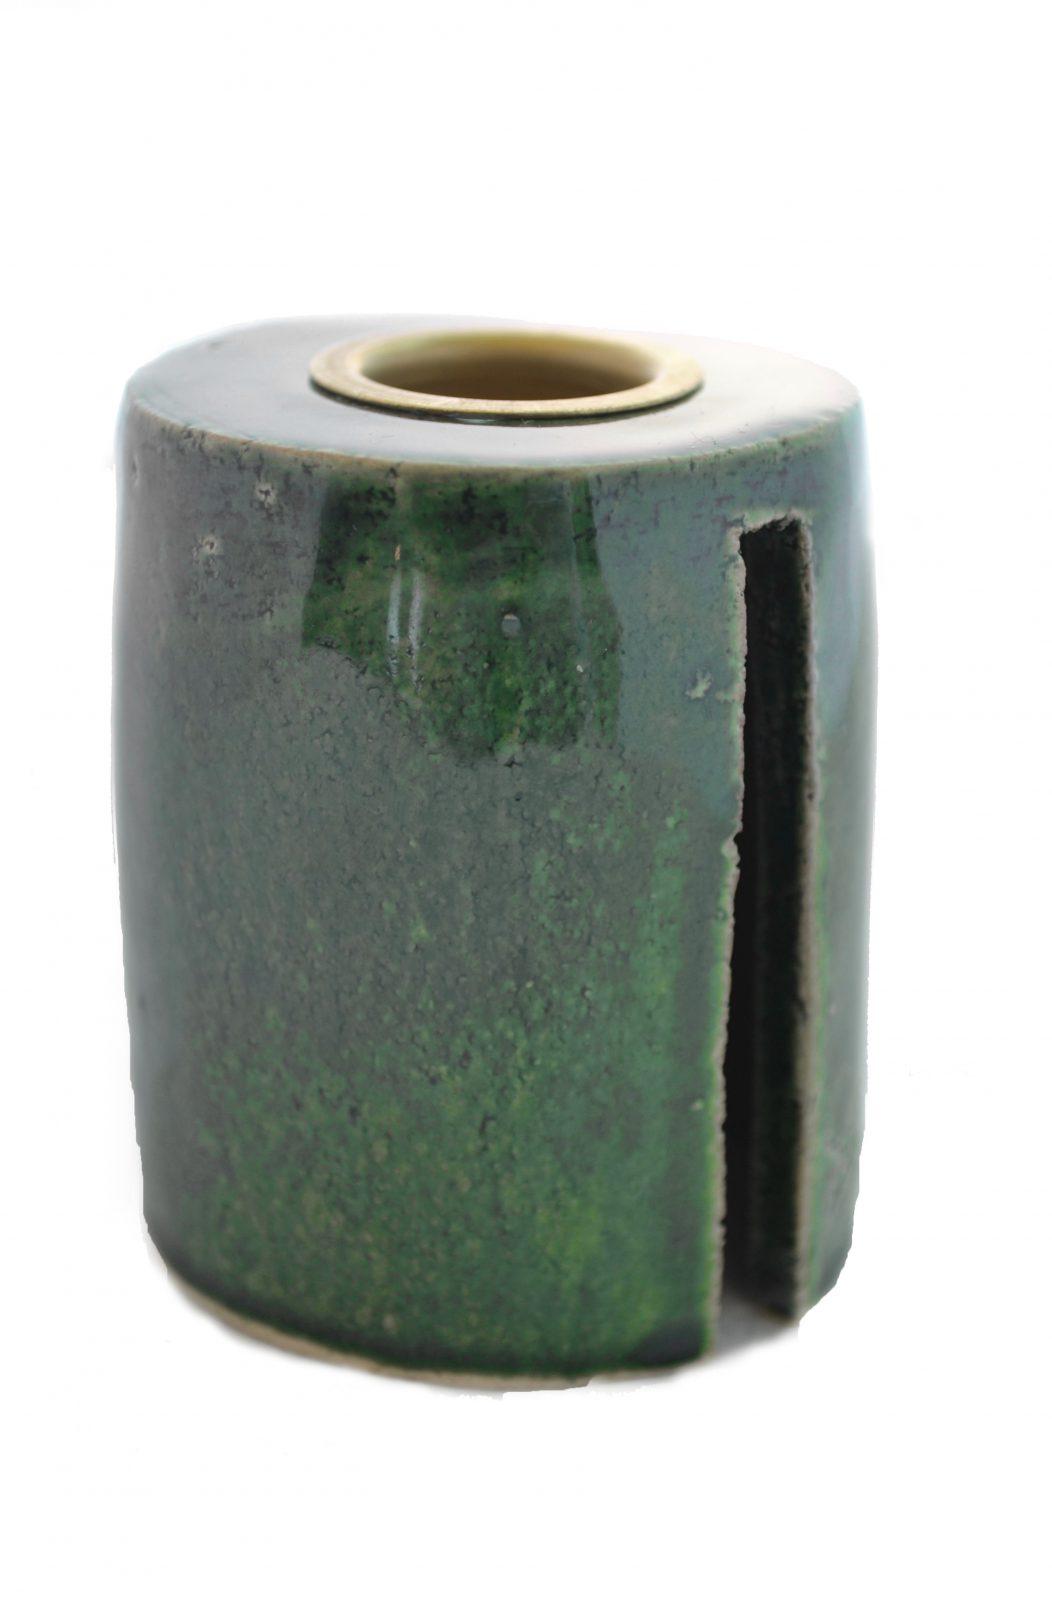 Keramik Lysestage - Grøn - Høj